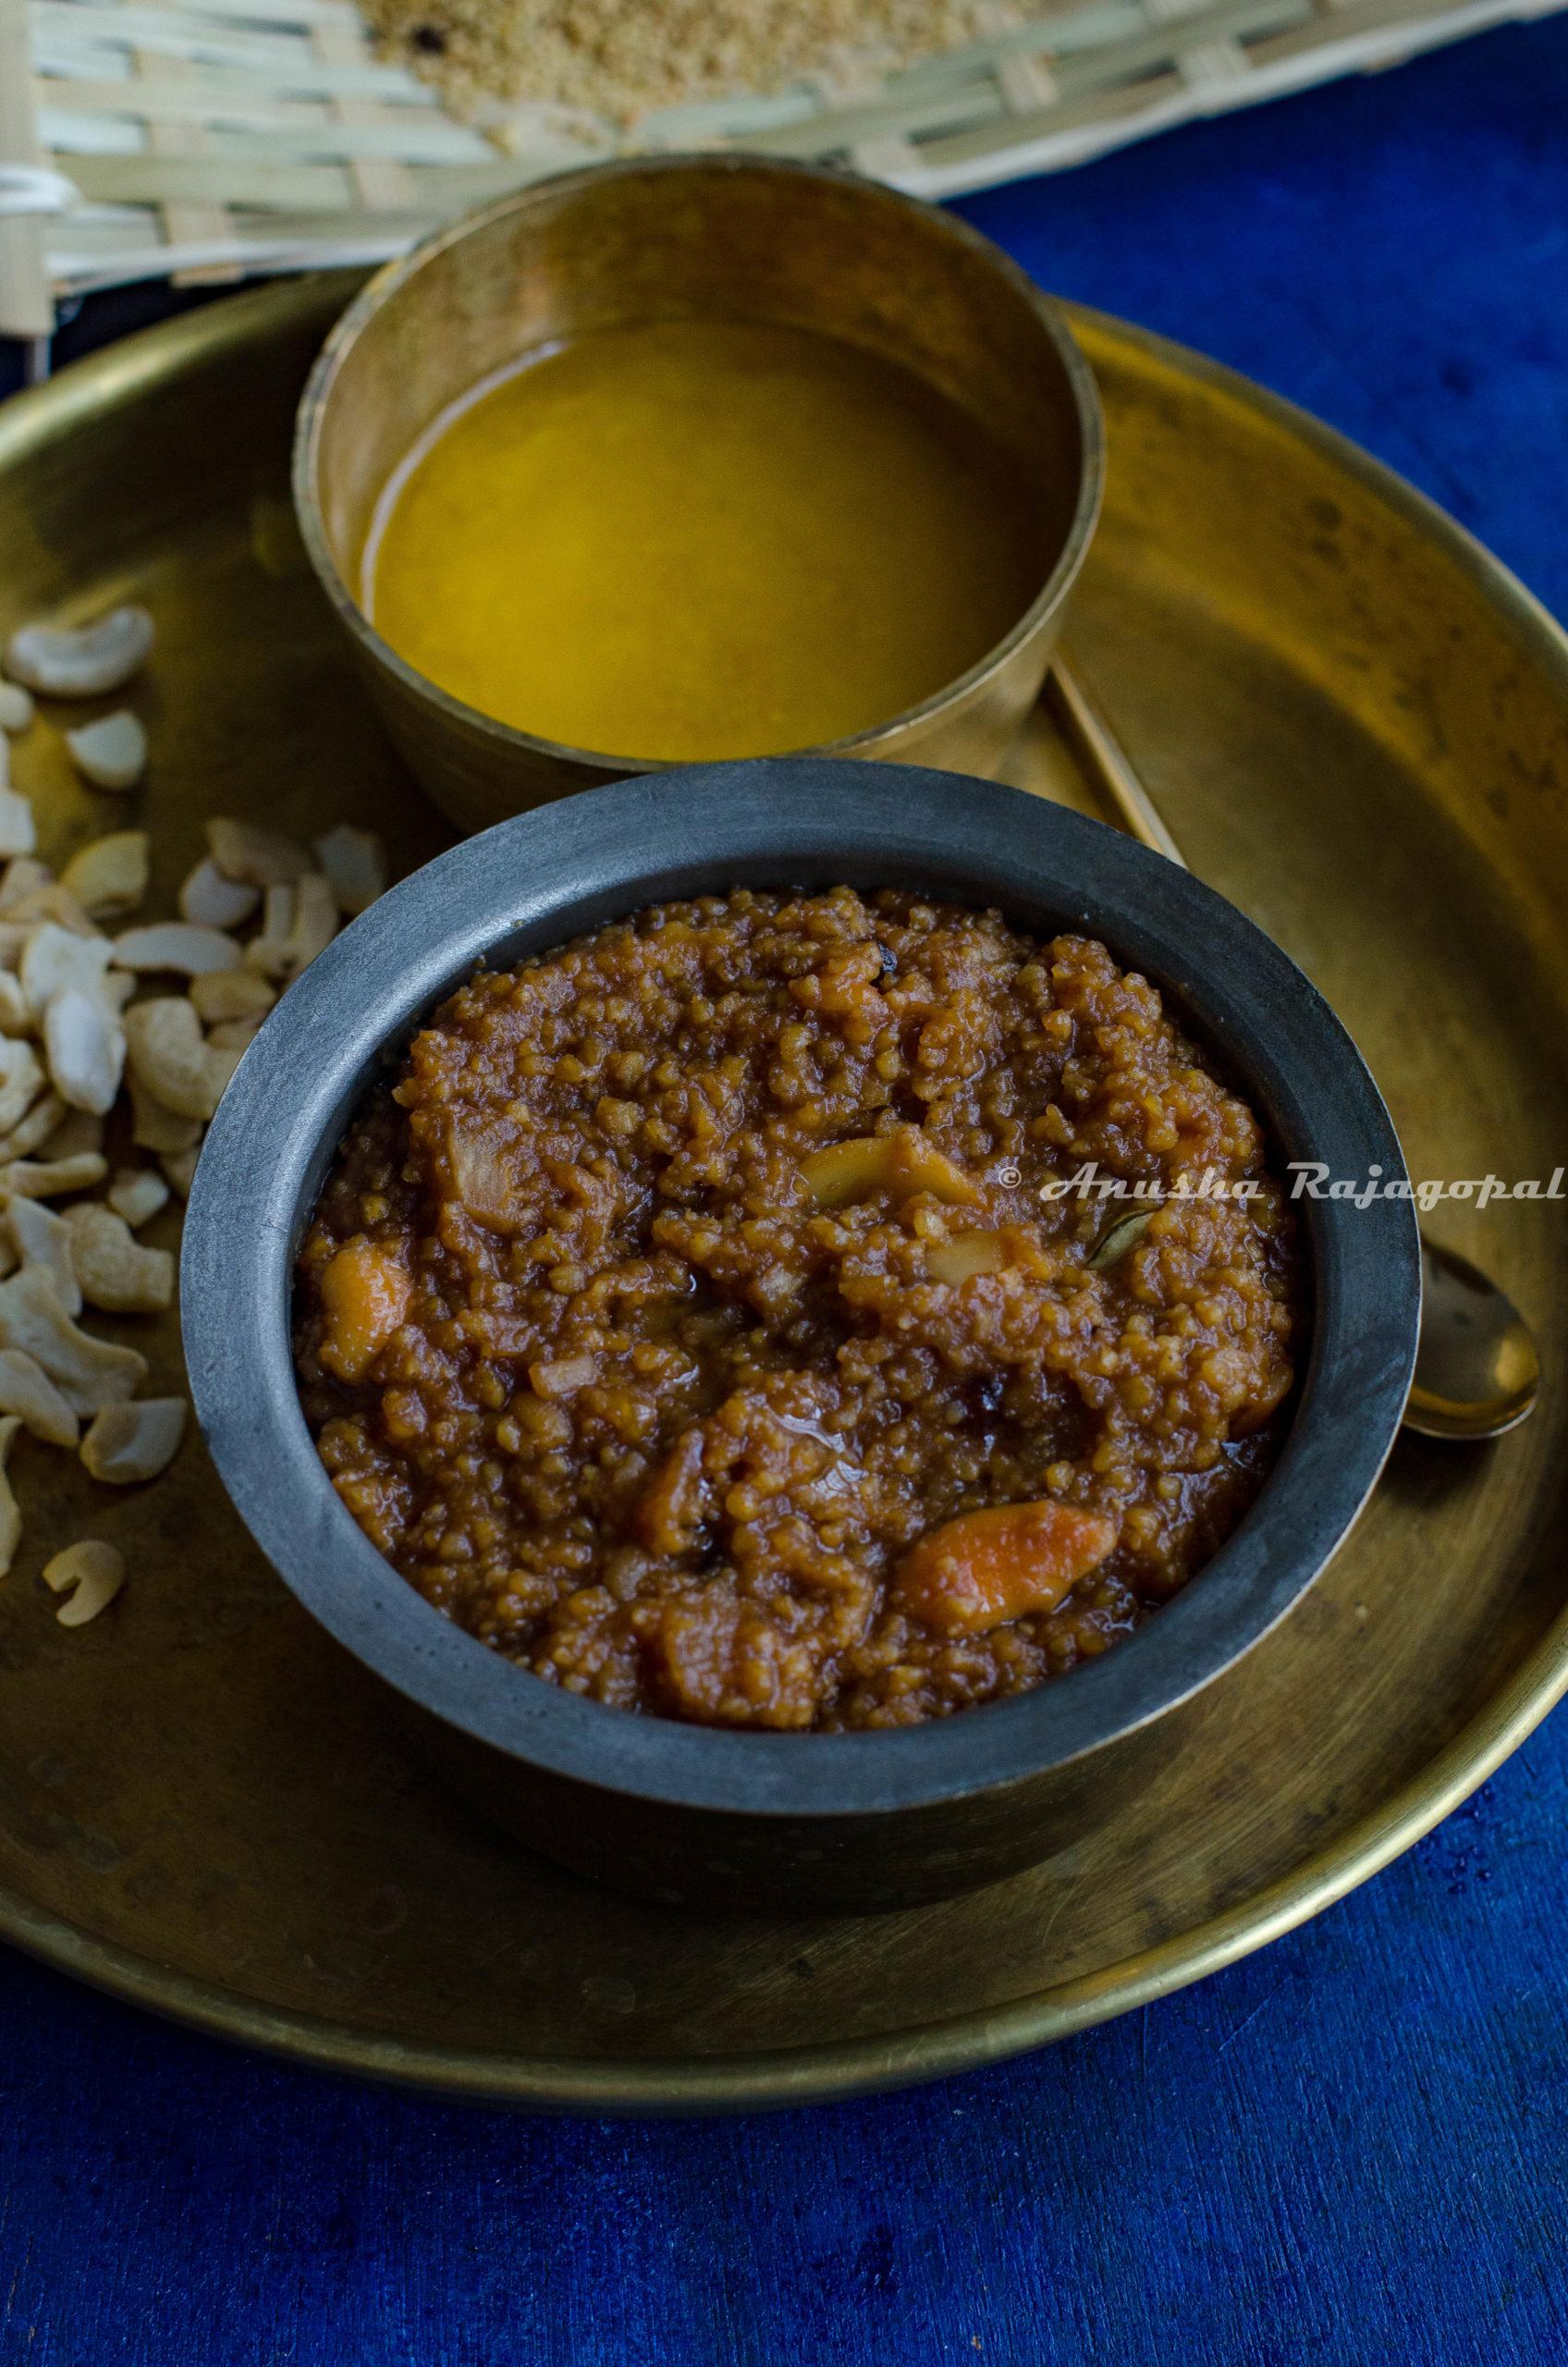 Thinai Sakkarai Pongal served in a brass bowl on a brass platter